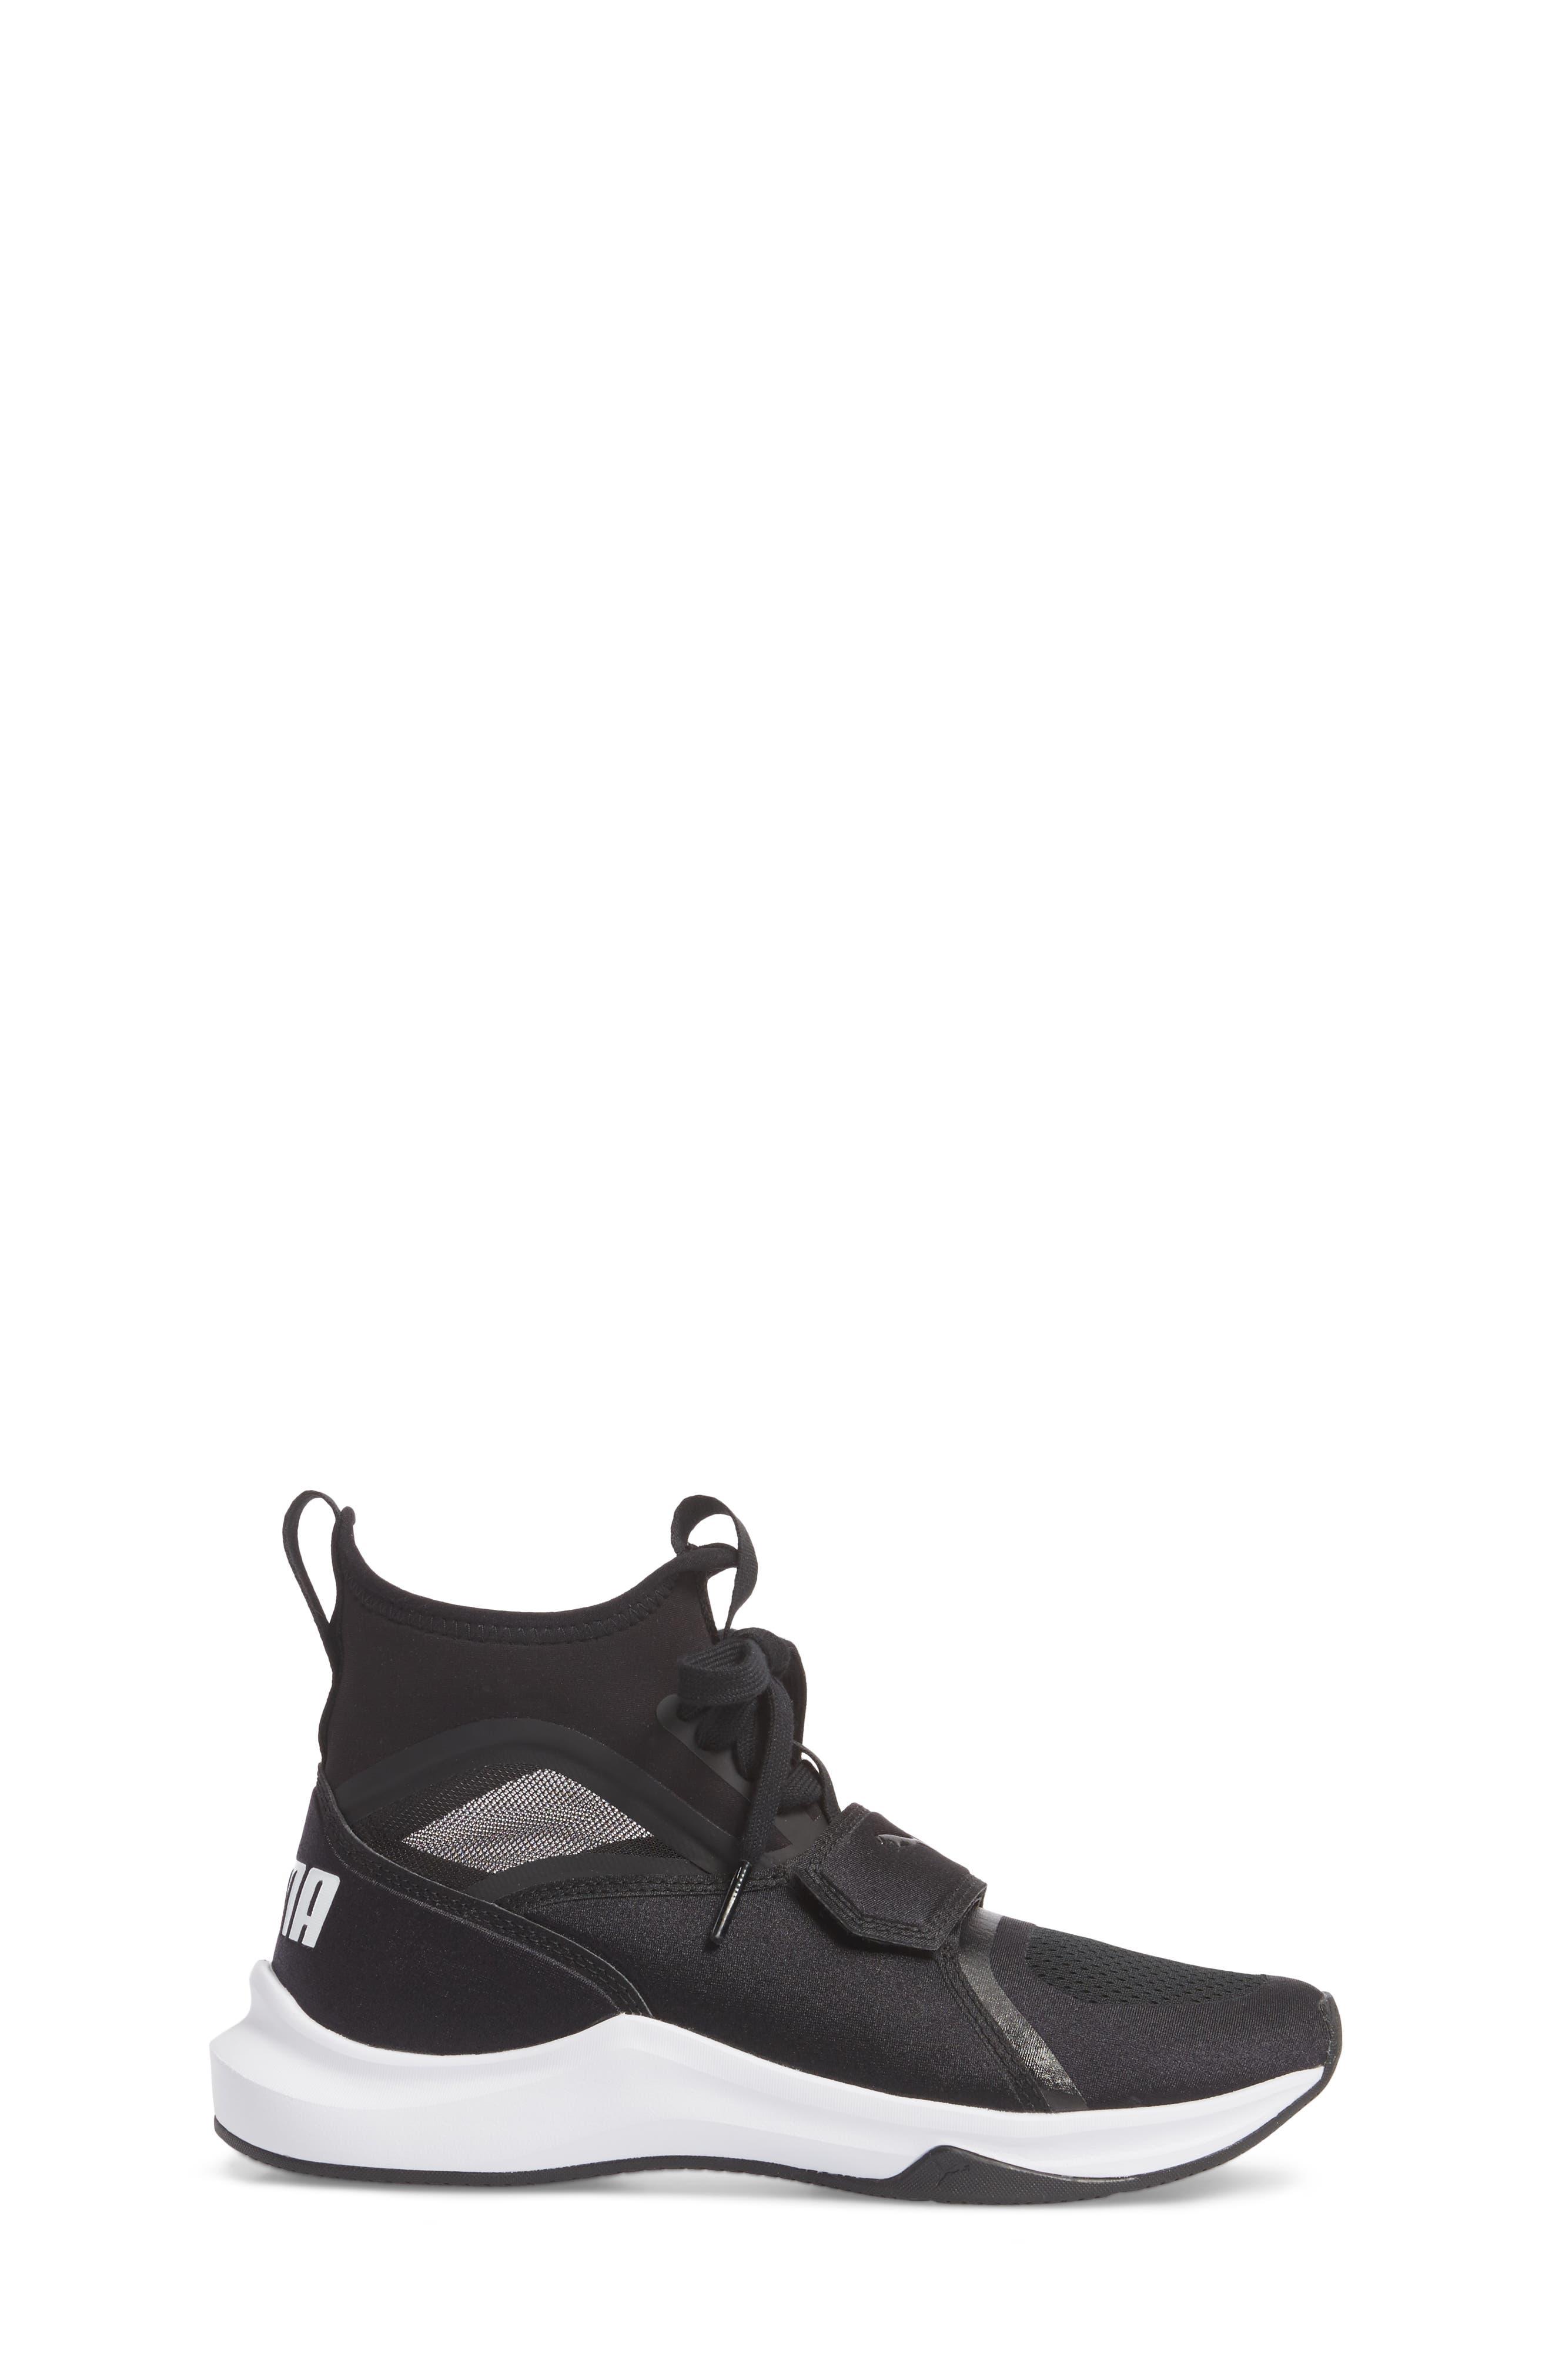 Phenom Jr High Top Sneaker,                             Alternate thumbnail 3, color,                             001